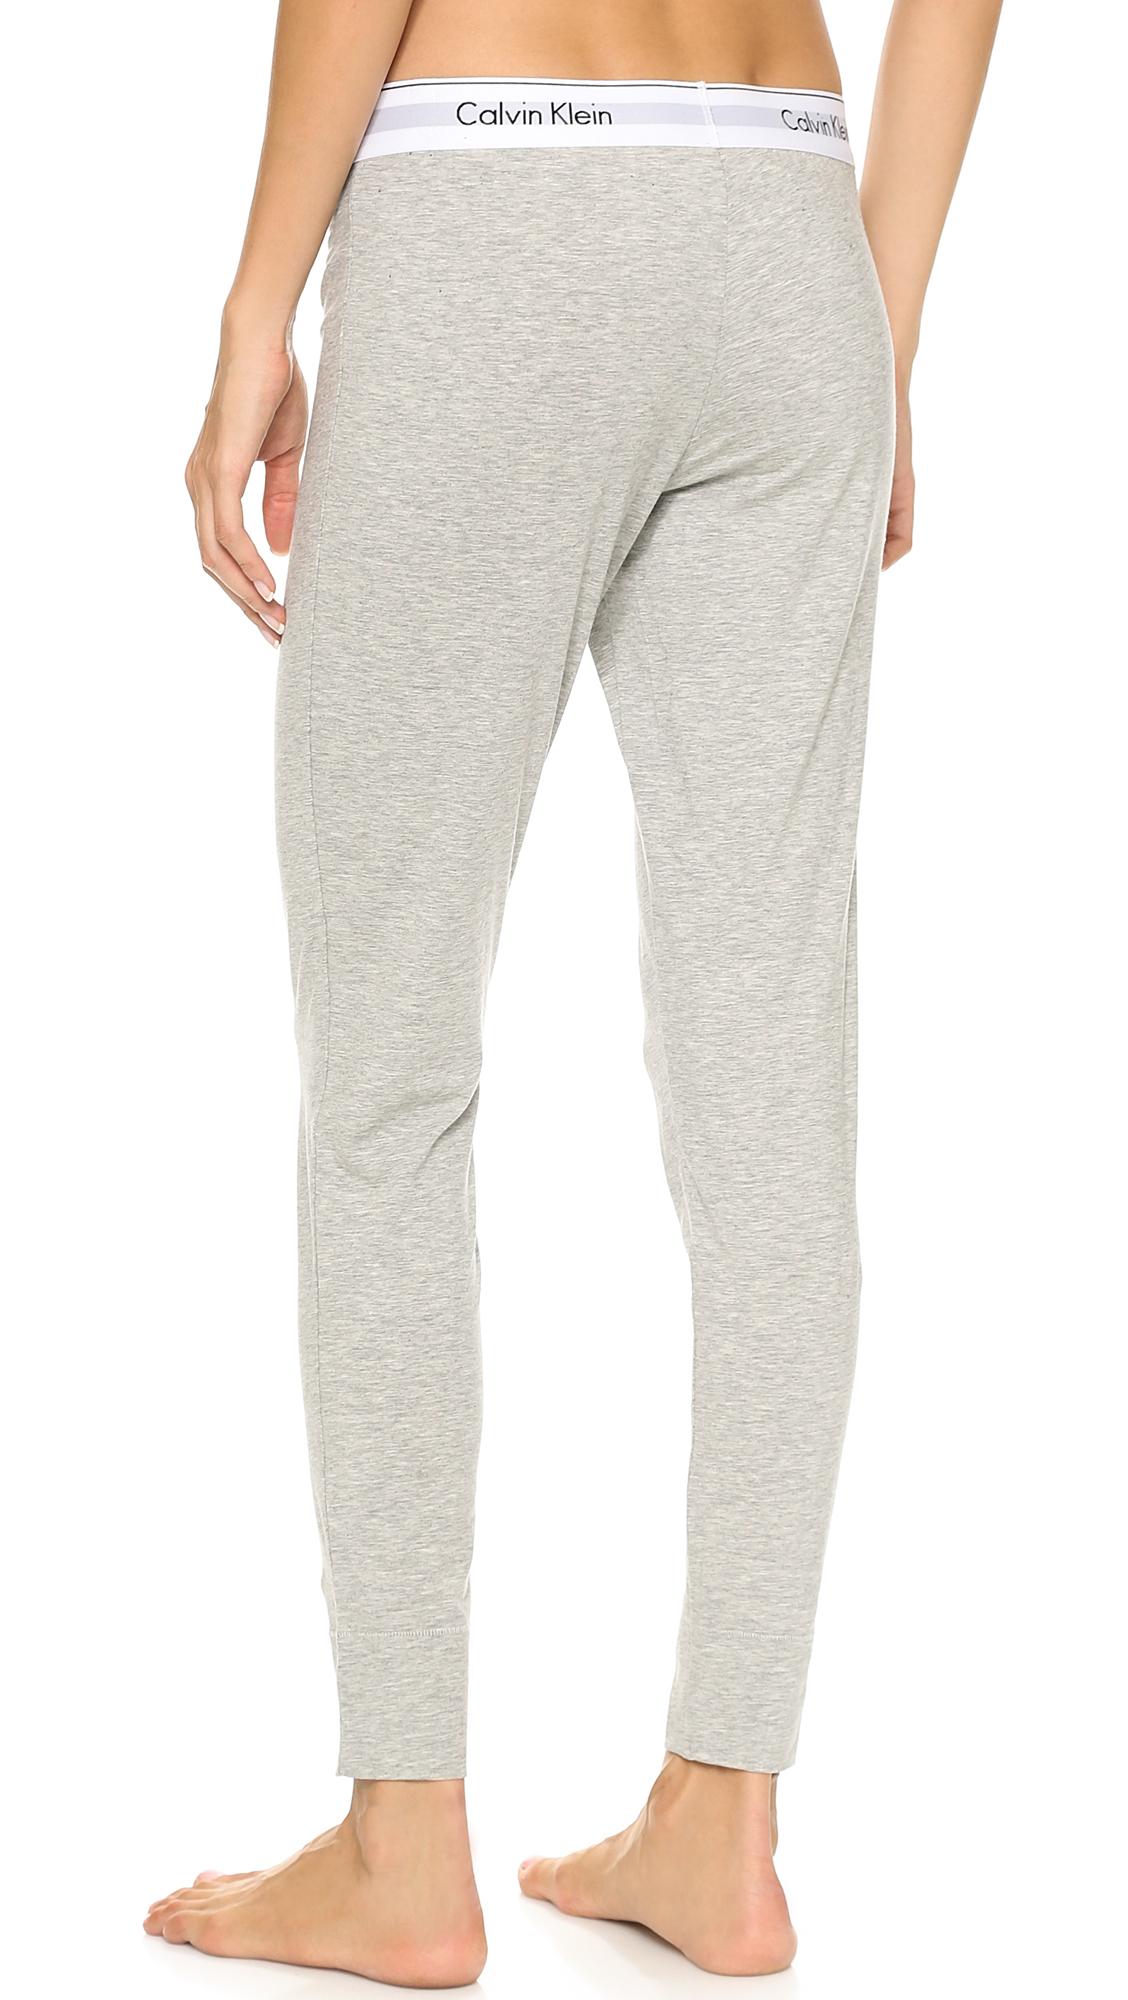 Lyst - Calvin Klein Modern Cotton Pants Grey Heather in Gray c08c356d2